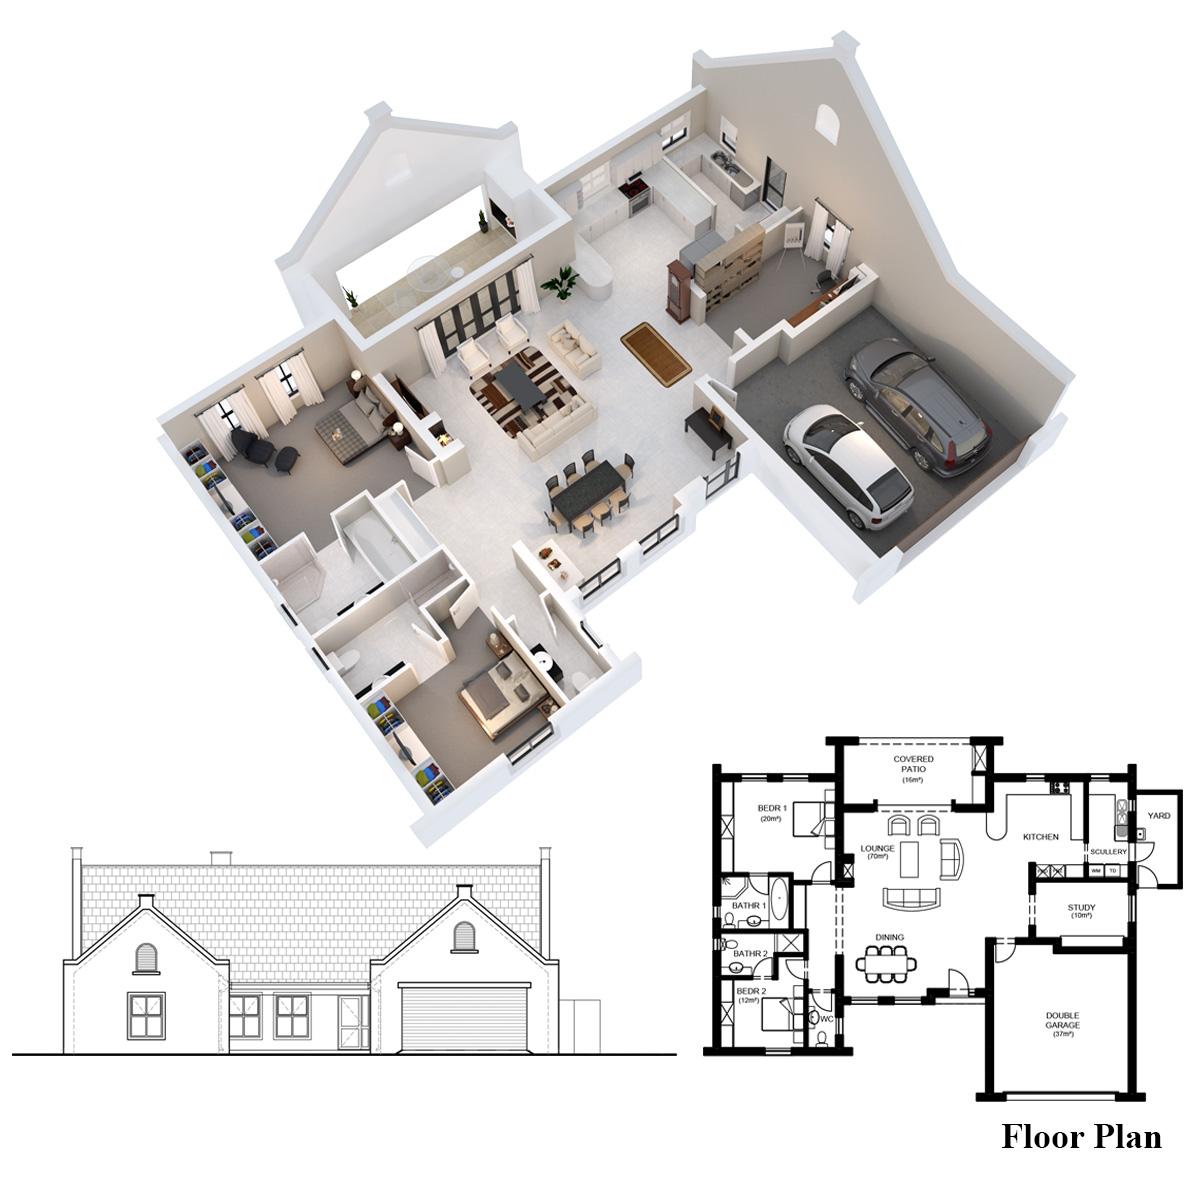 zevenwacht_lifestyle_estate_retirement_home_type-e_1200x1191